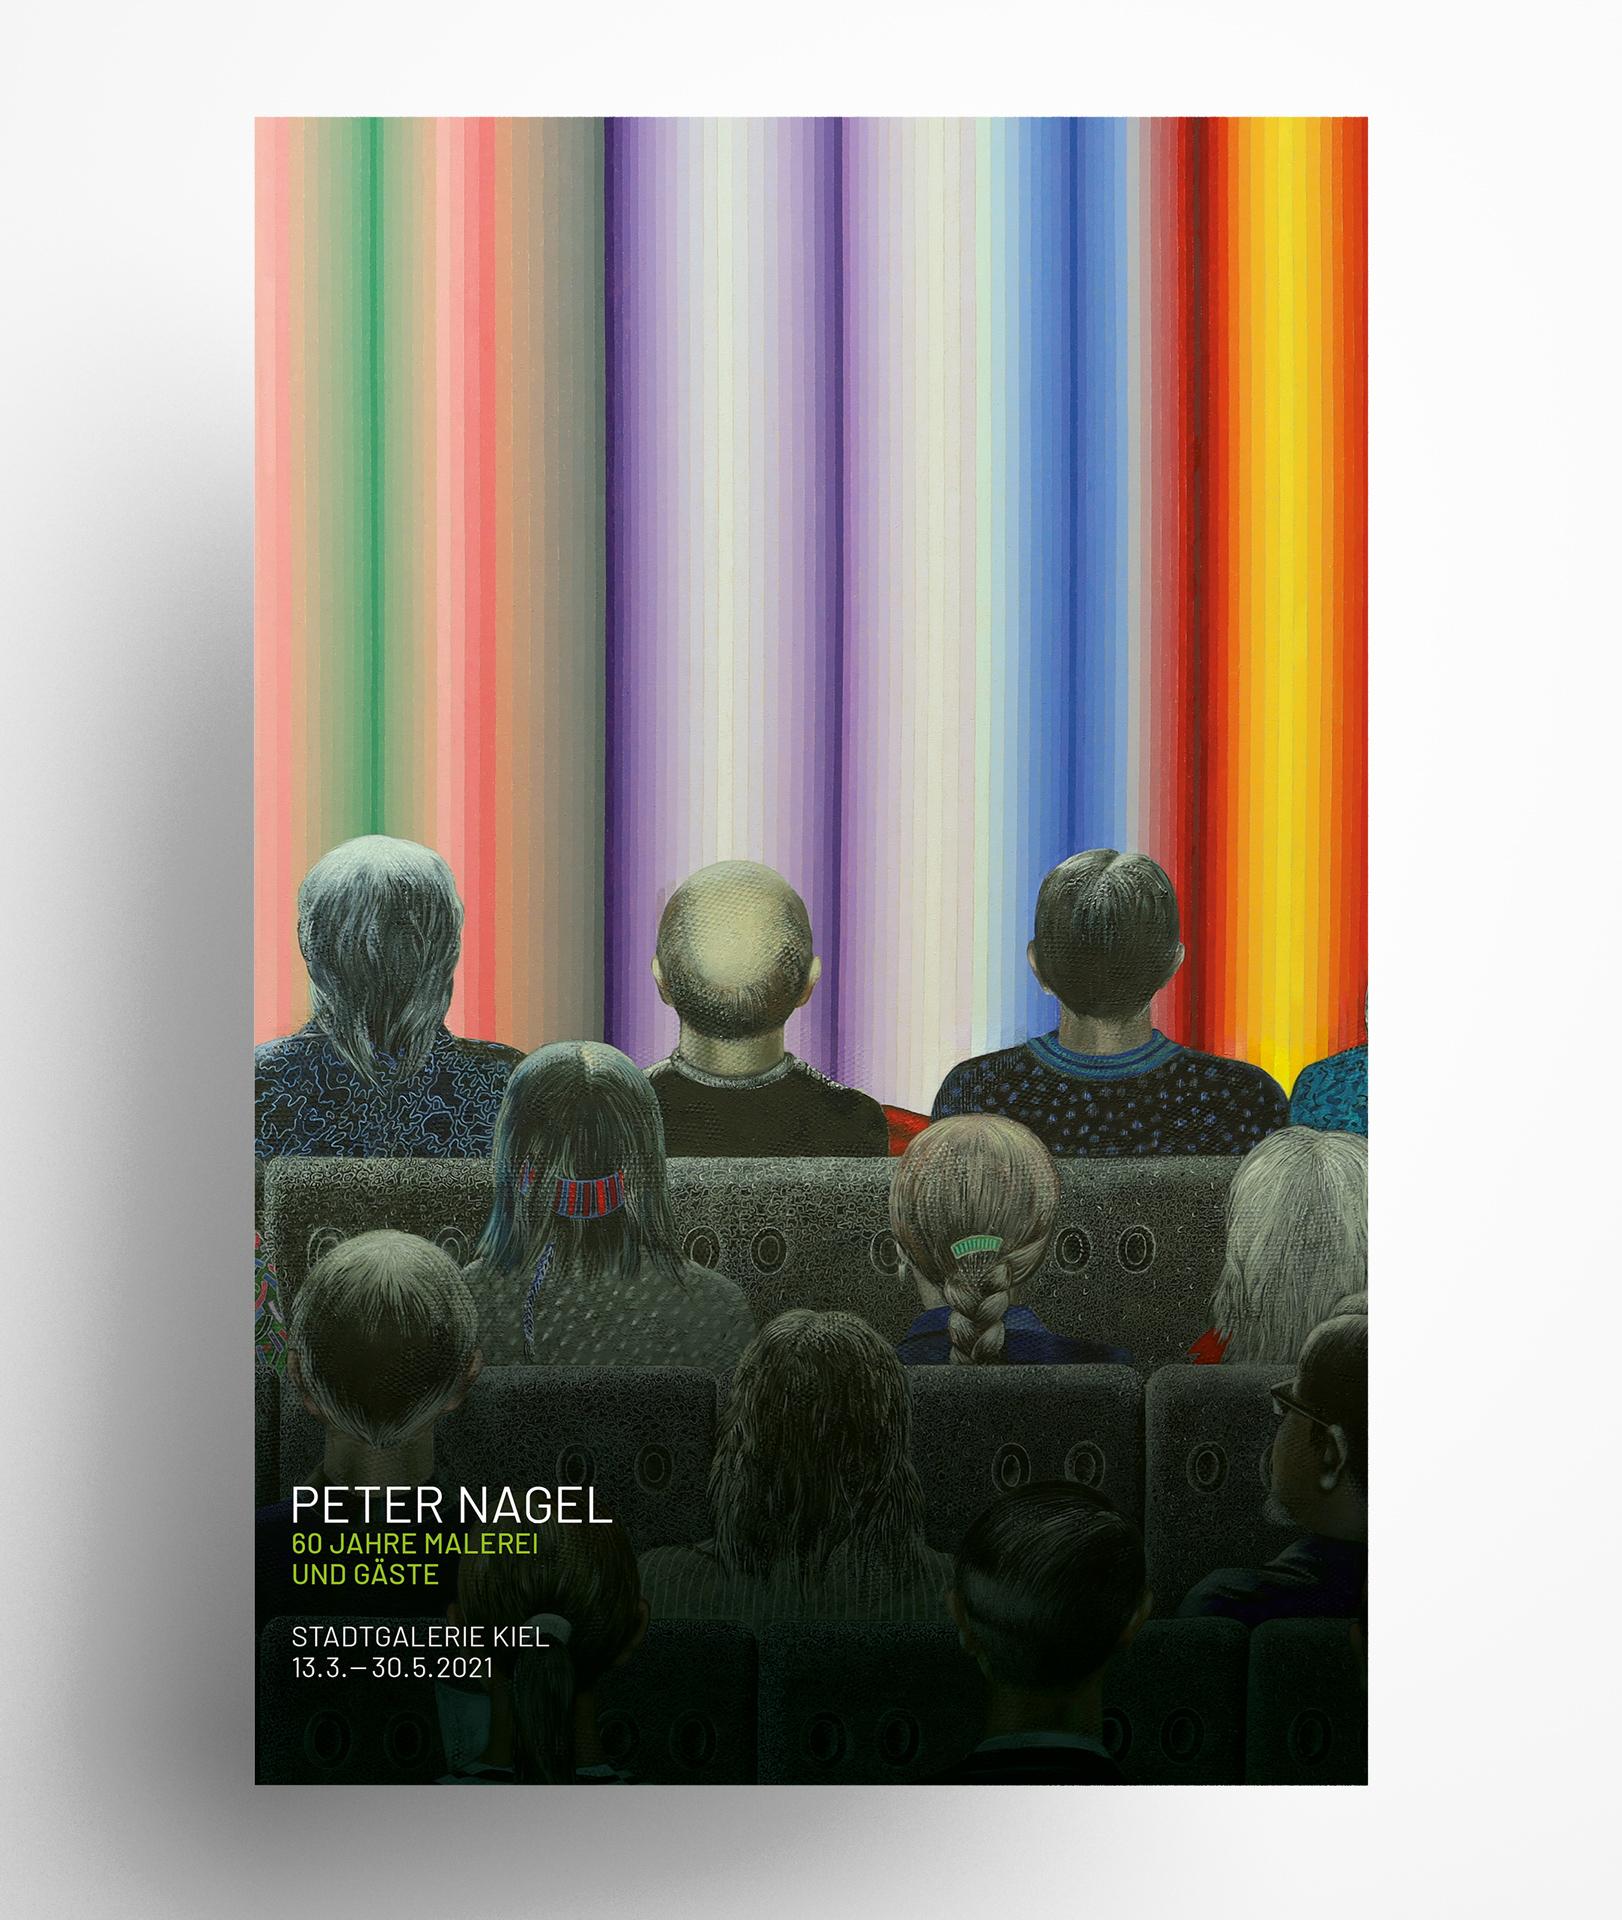 Peter Nagel, Kunstbetrachtung II [Detail], 2019/20